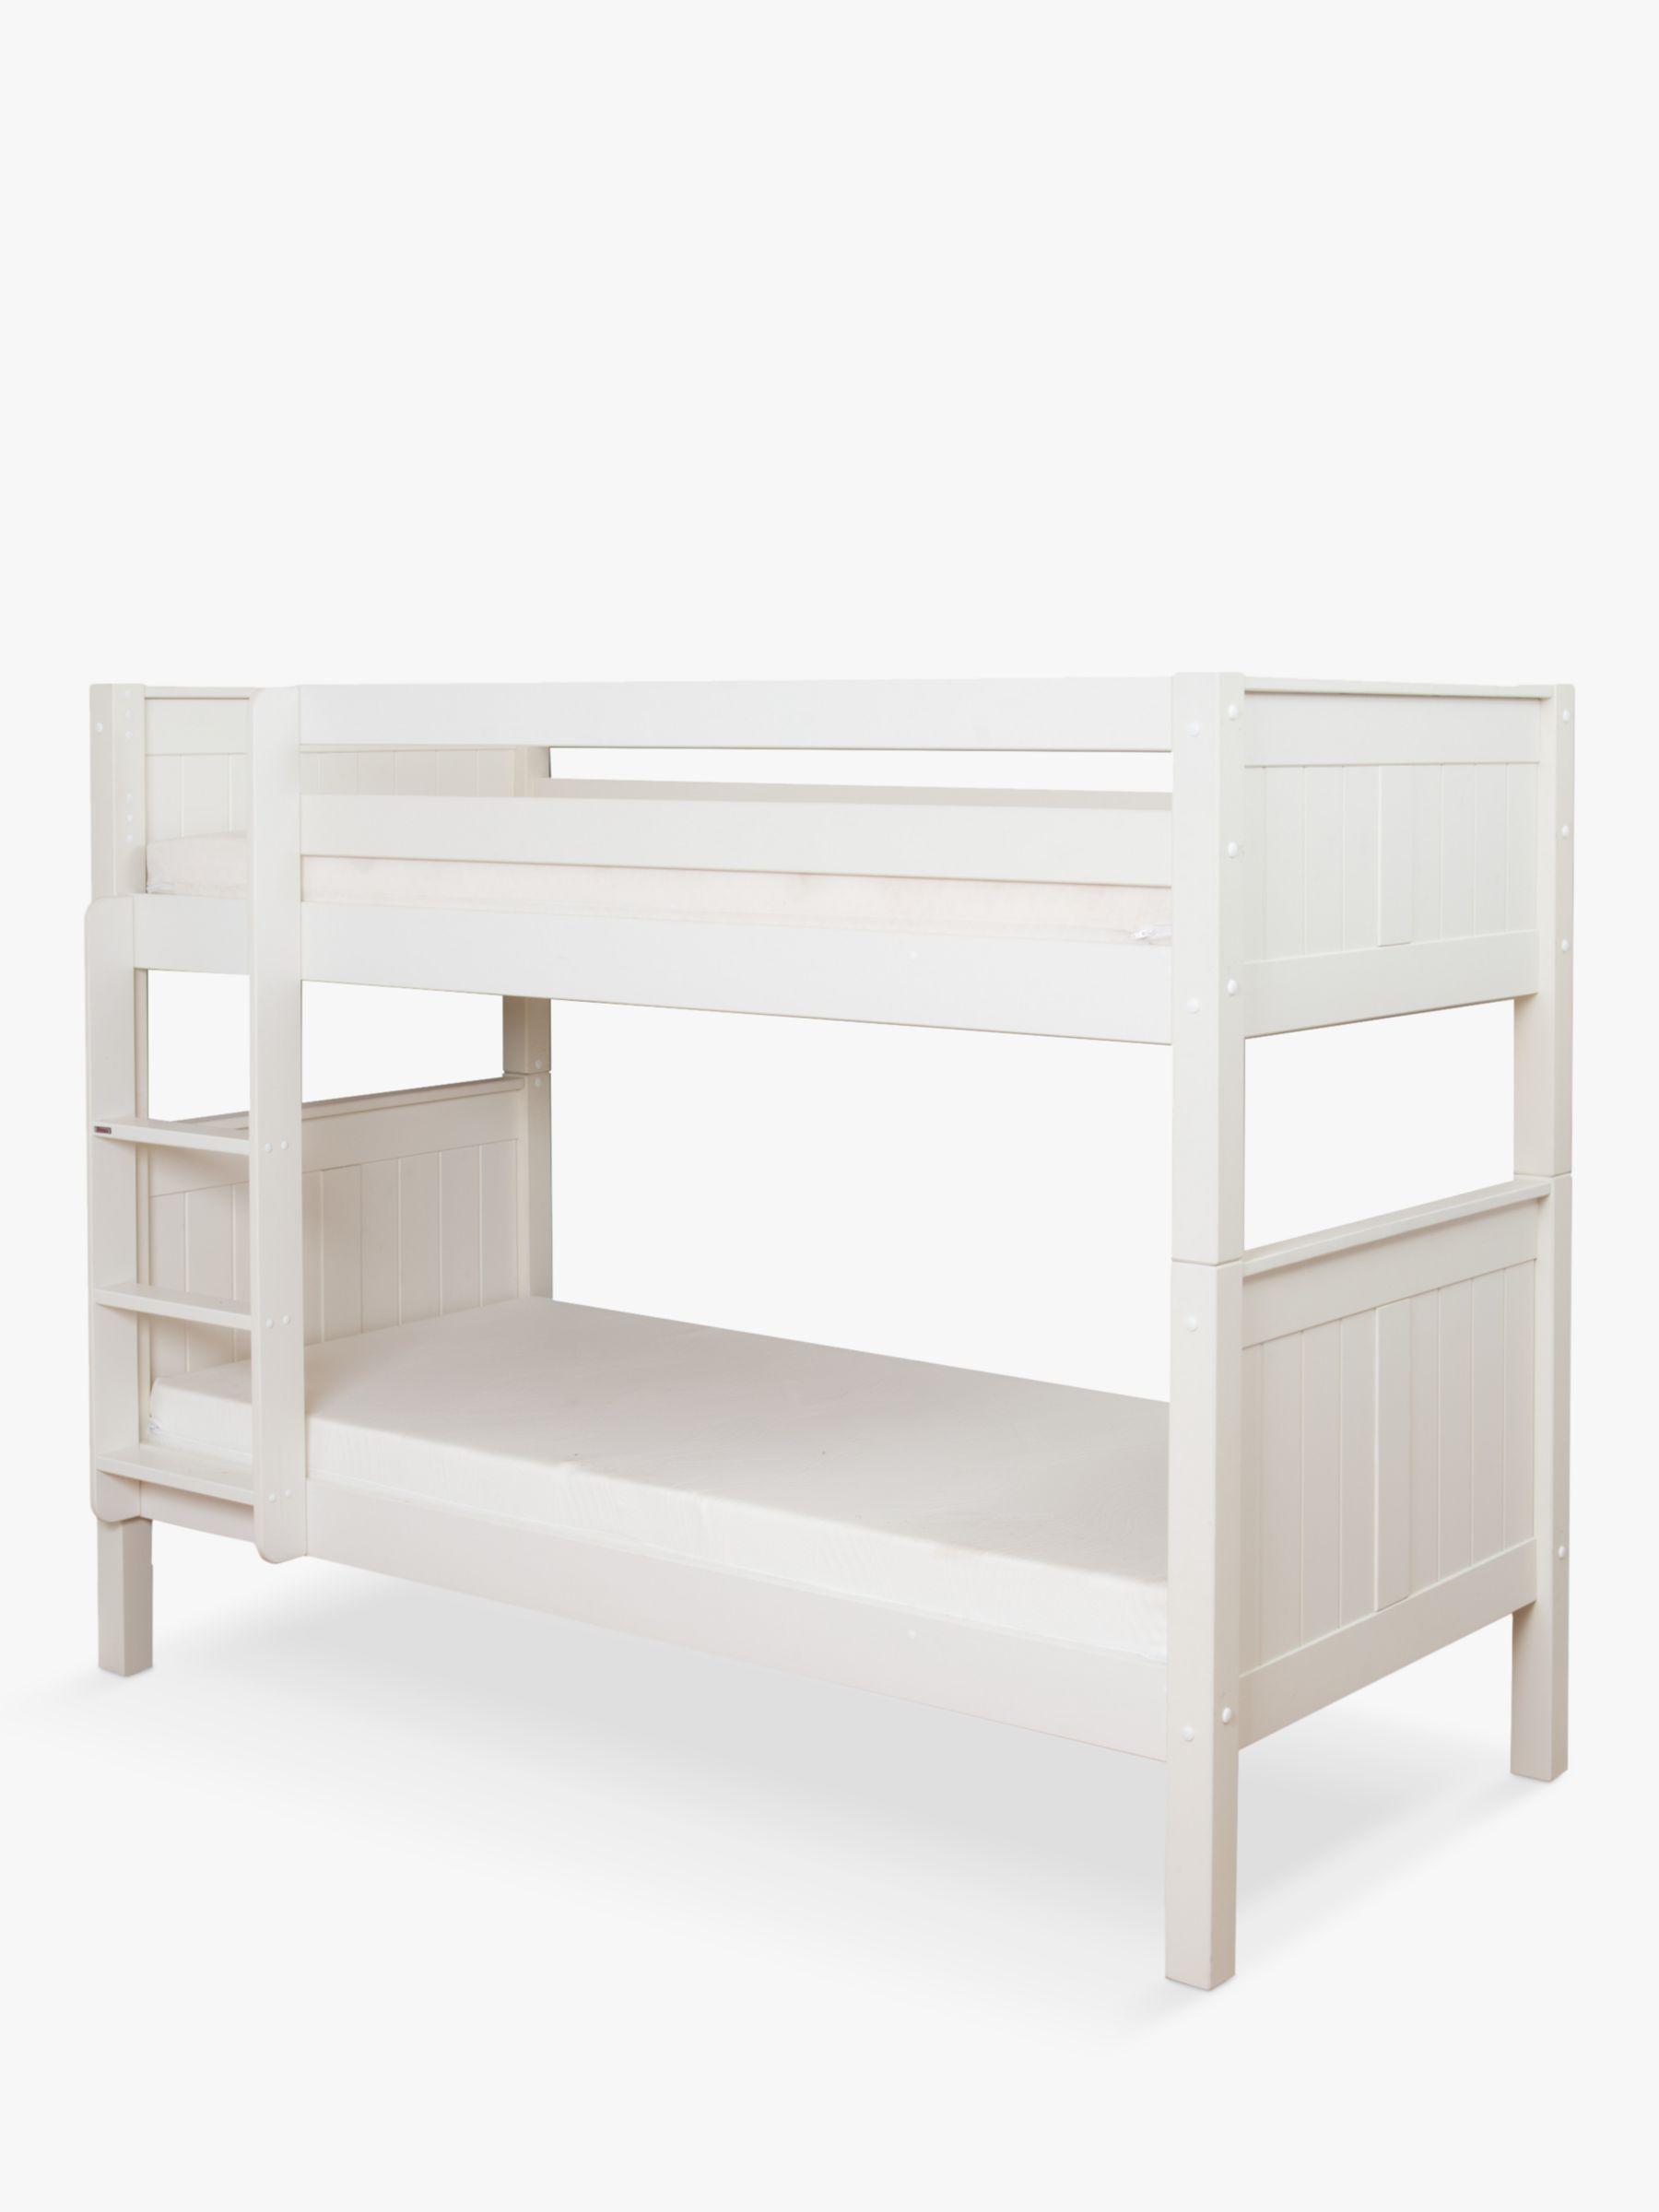 Stompa Classic Child Compliant Bunk Bed, Single, White